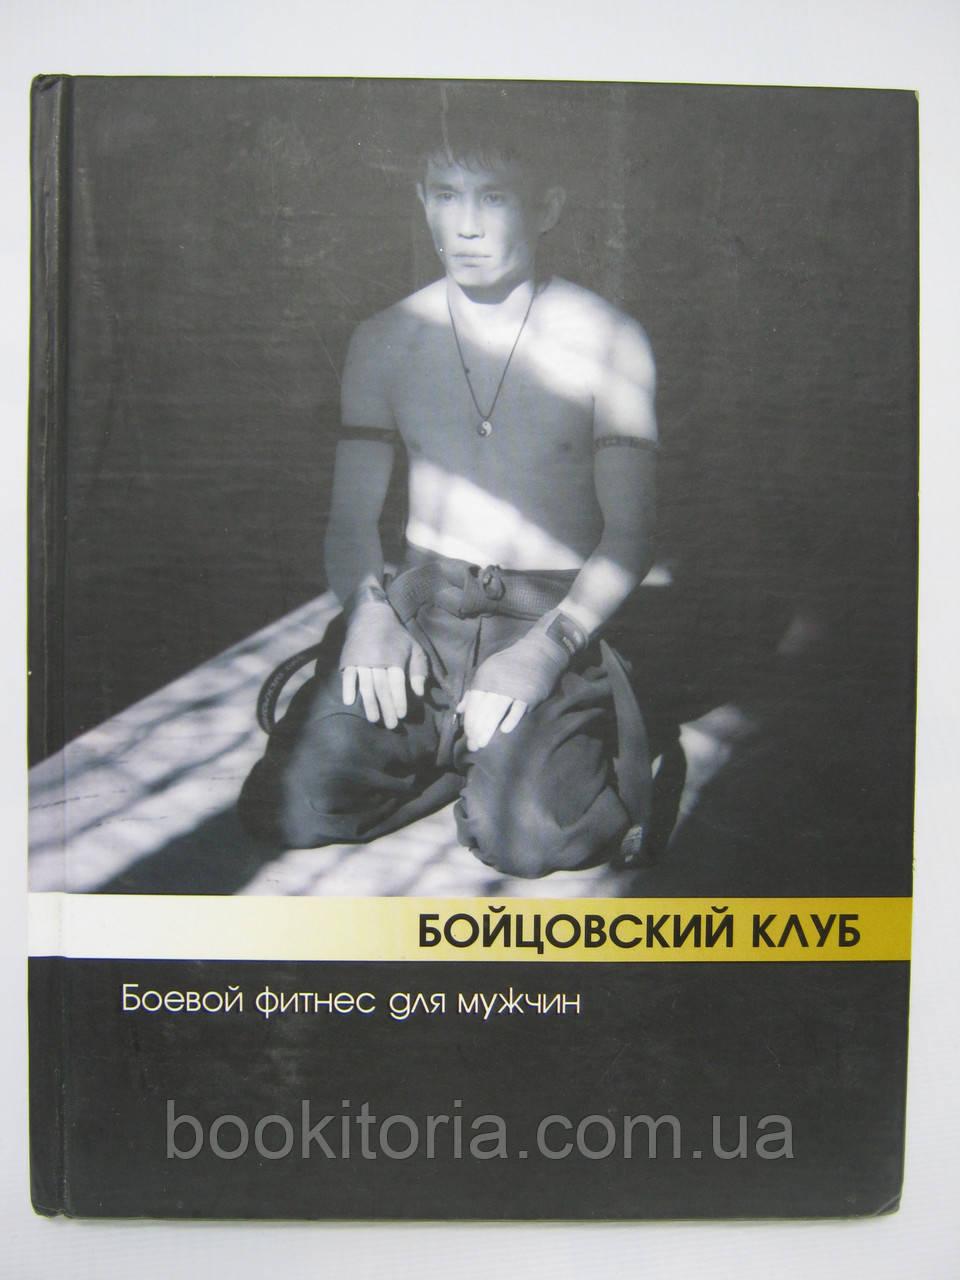 Бэкман Б., Атилов А. Бойцовский клуб: боевой фитнес для мужчин (б/у).